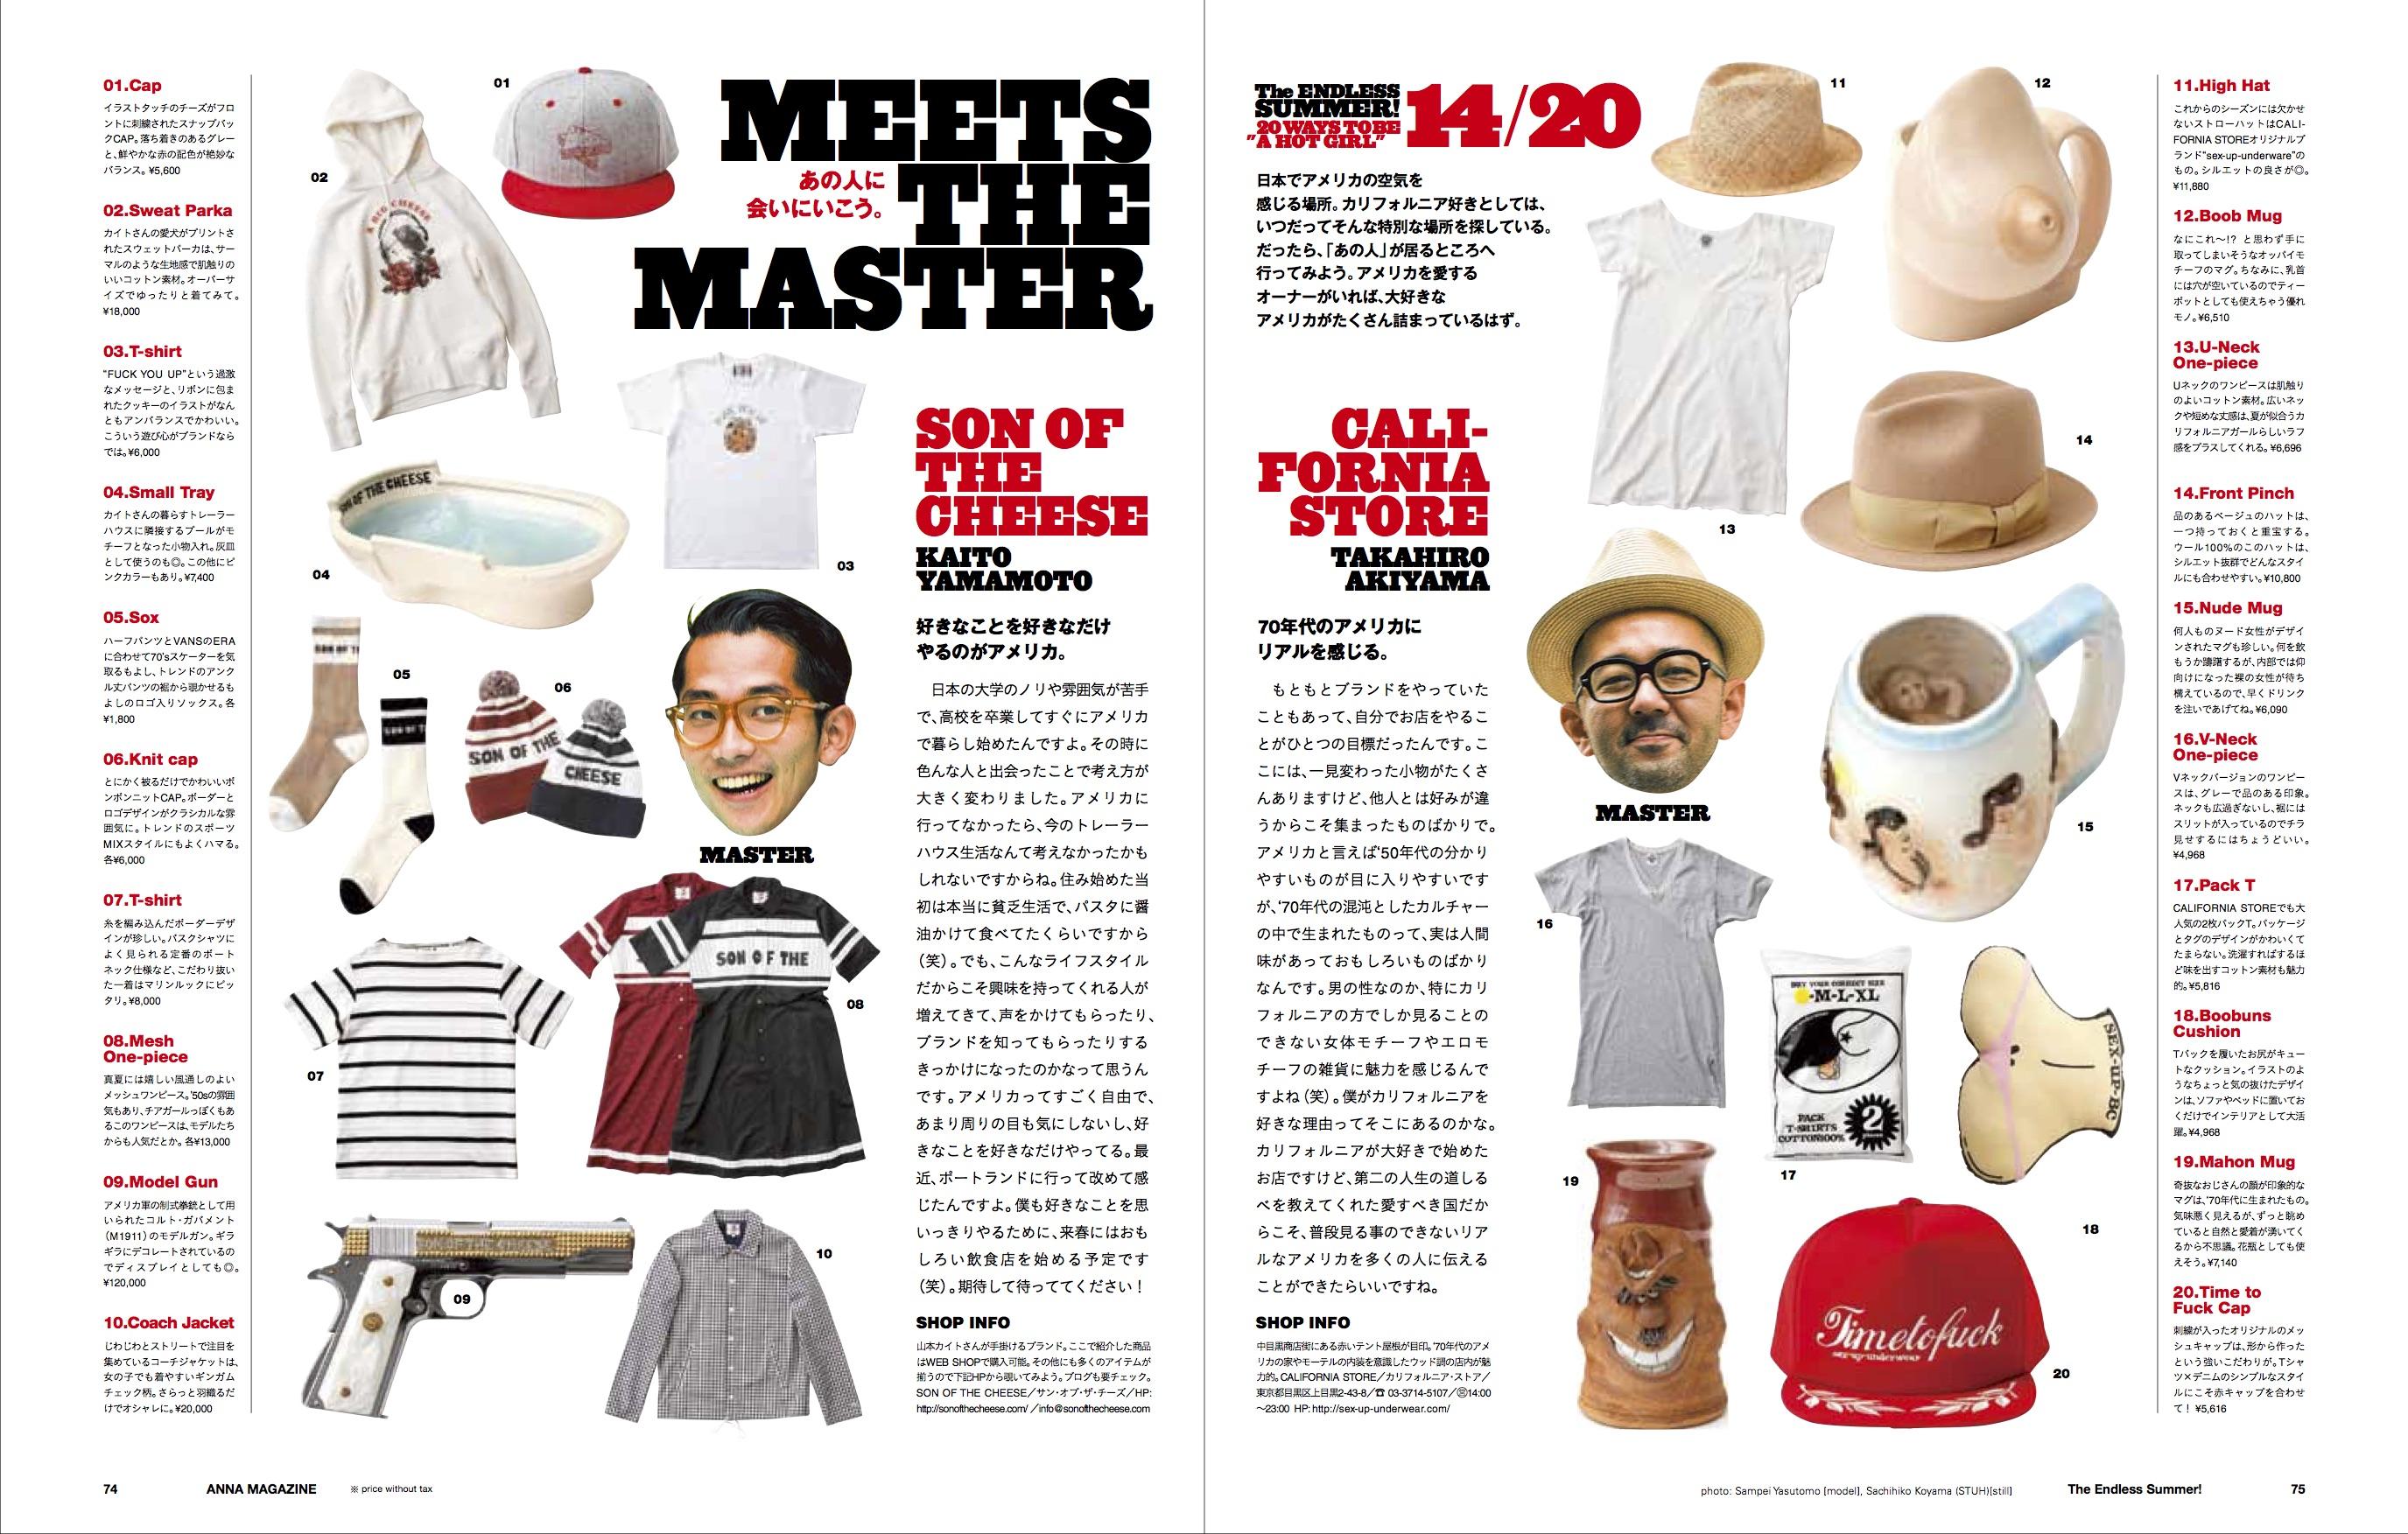 anna magazine Vol.3 P20